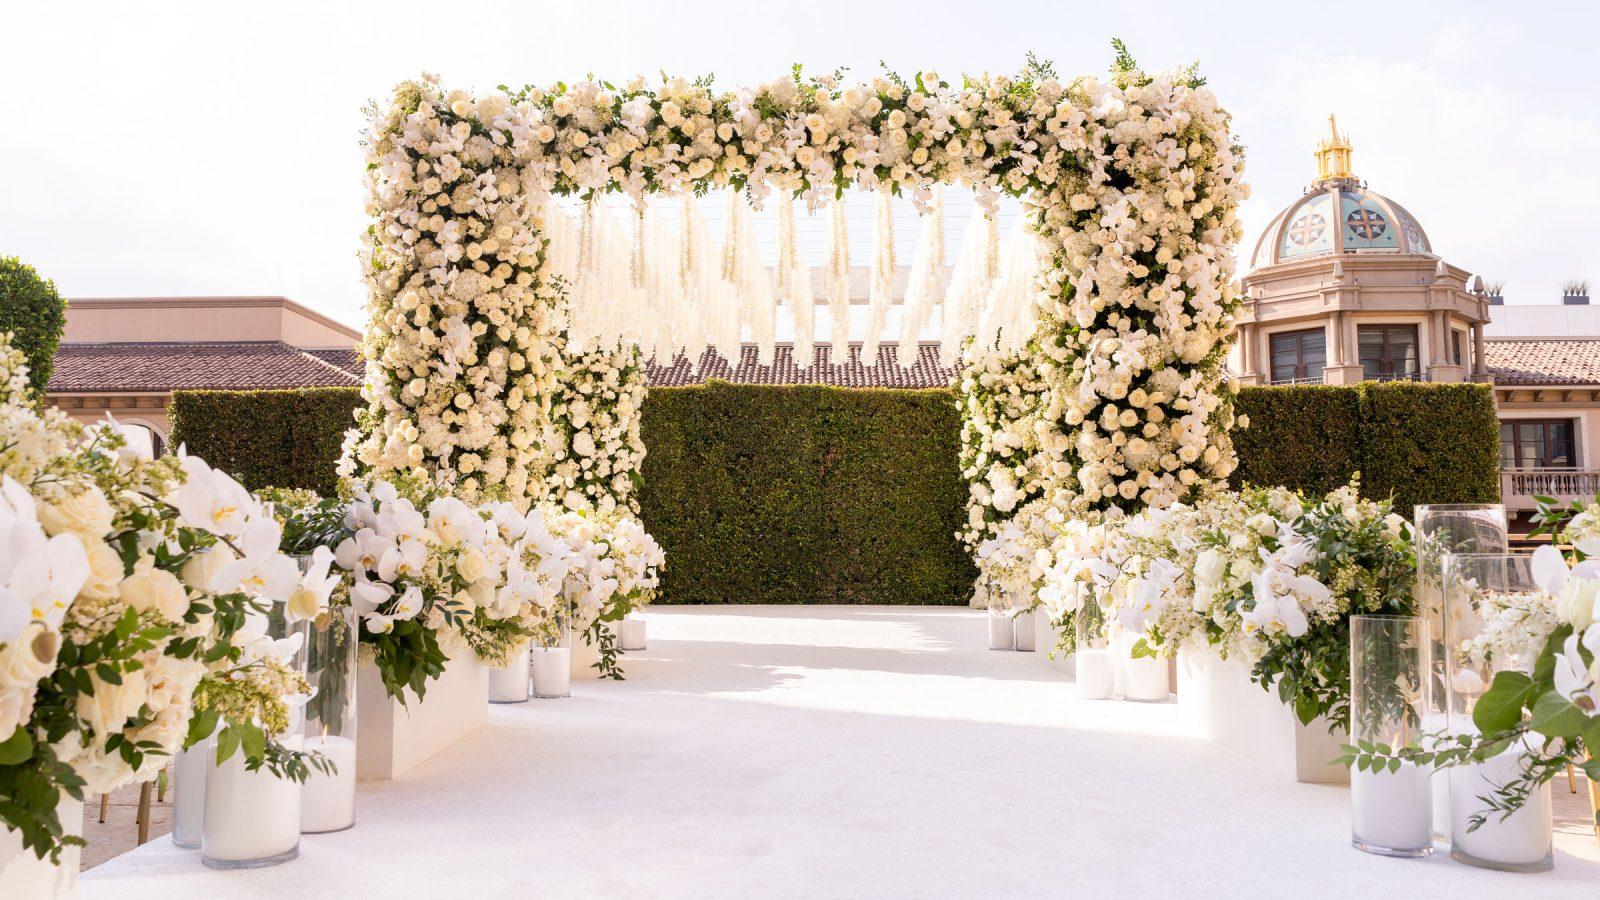 maria-eduardo-montage-beverly-hills-wedding-103.jpg